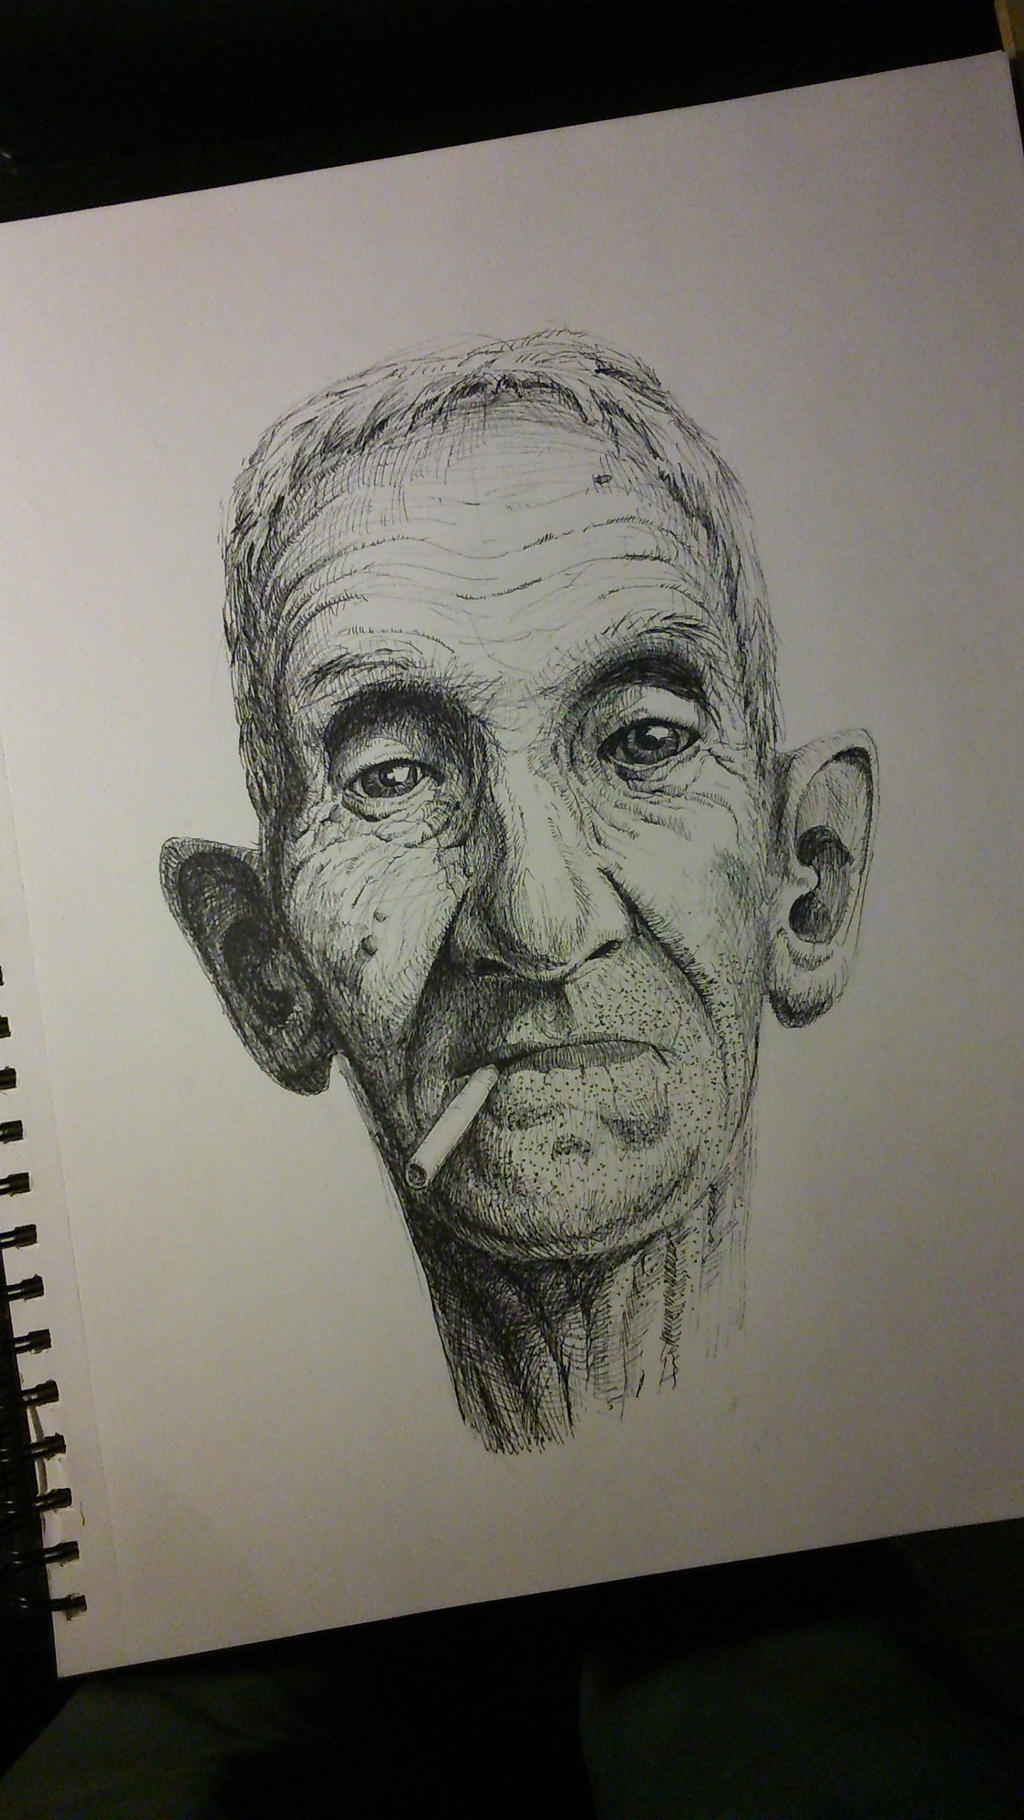 old geezer by TomHeye